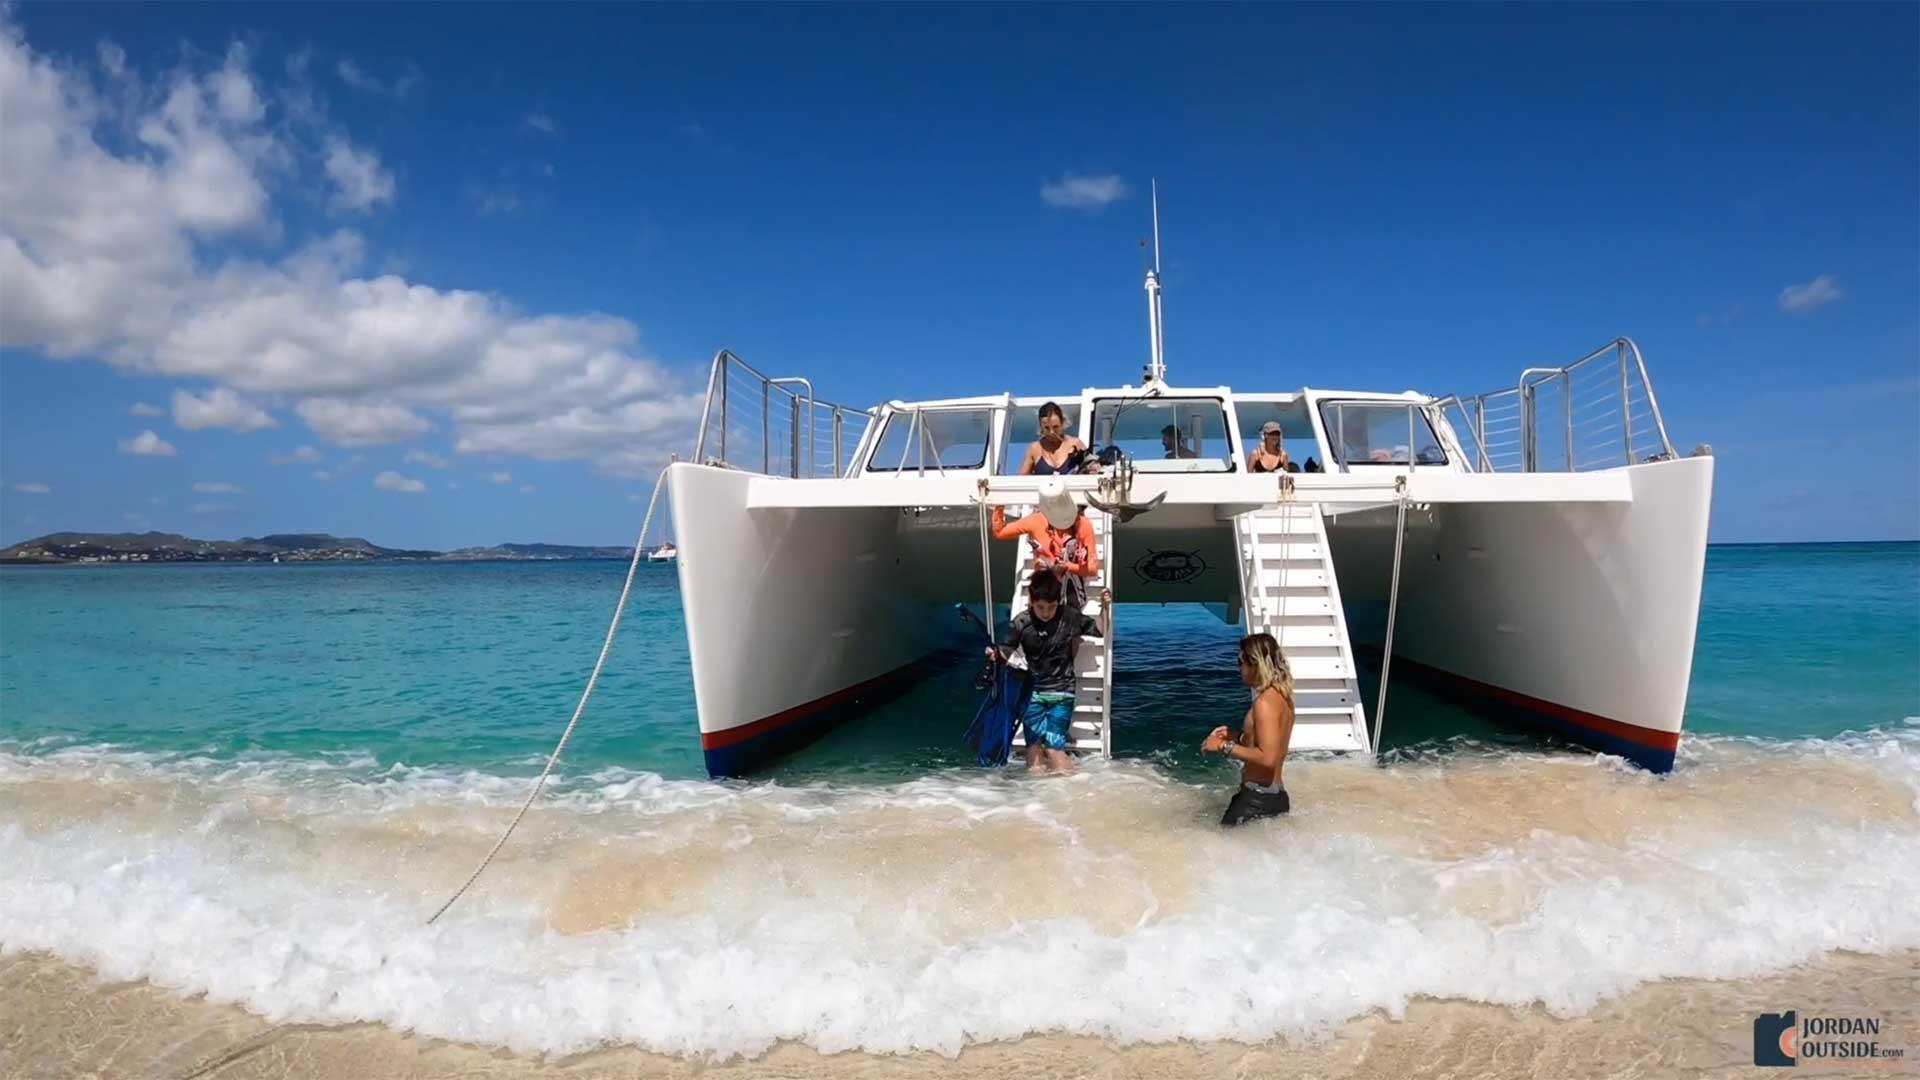 Getting Off the Catamaran at Turtle Beach, St. Croix